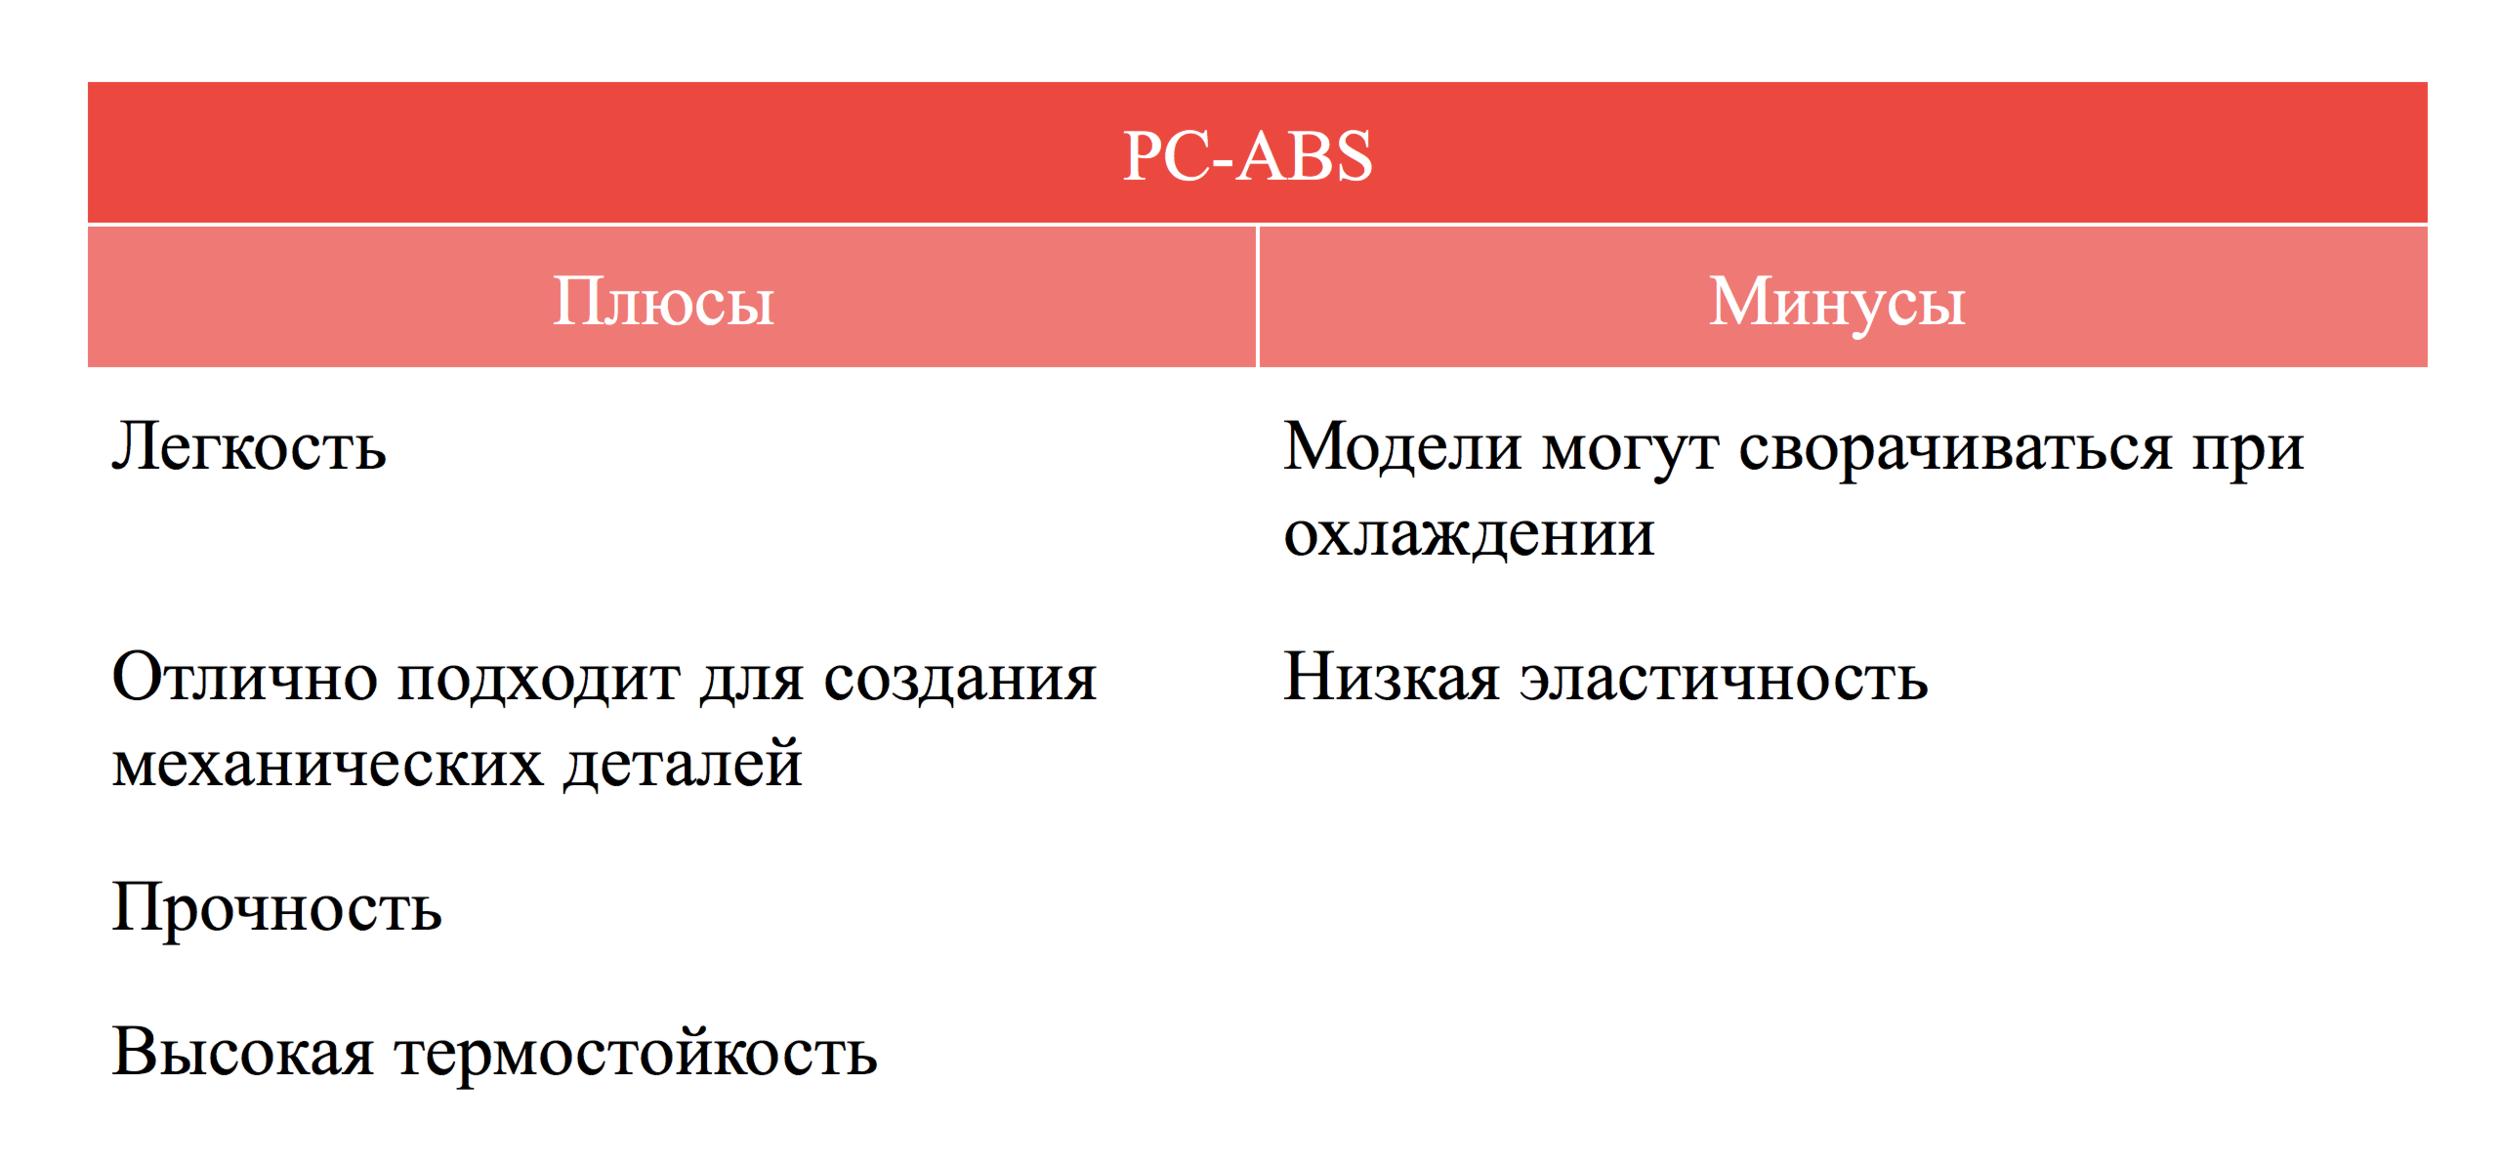 Плюсы и минусы PC-ABS пластика qbed.space.png